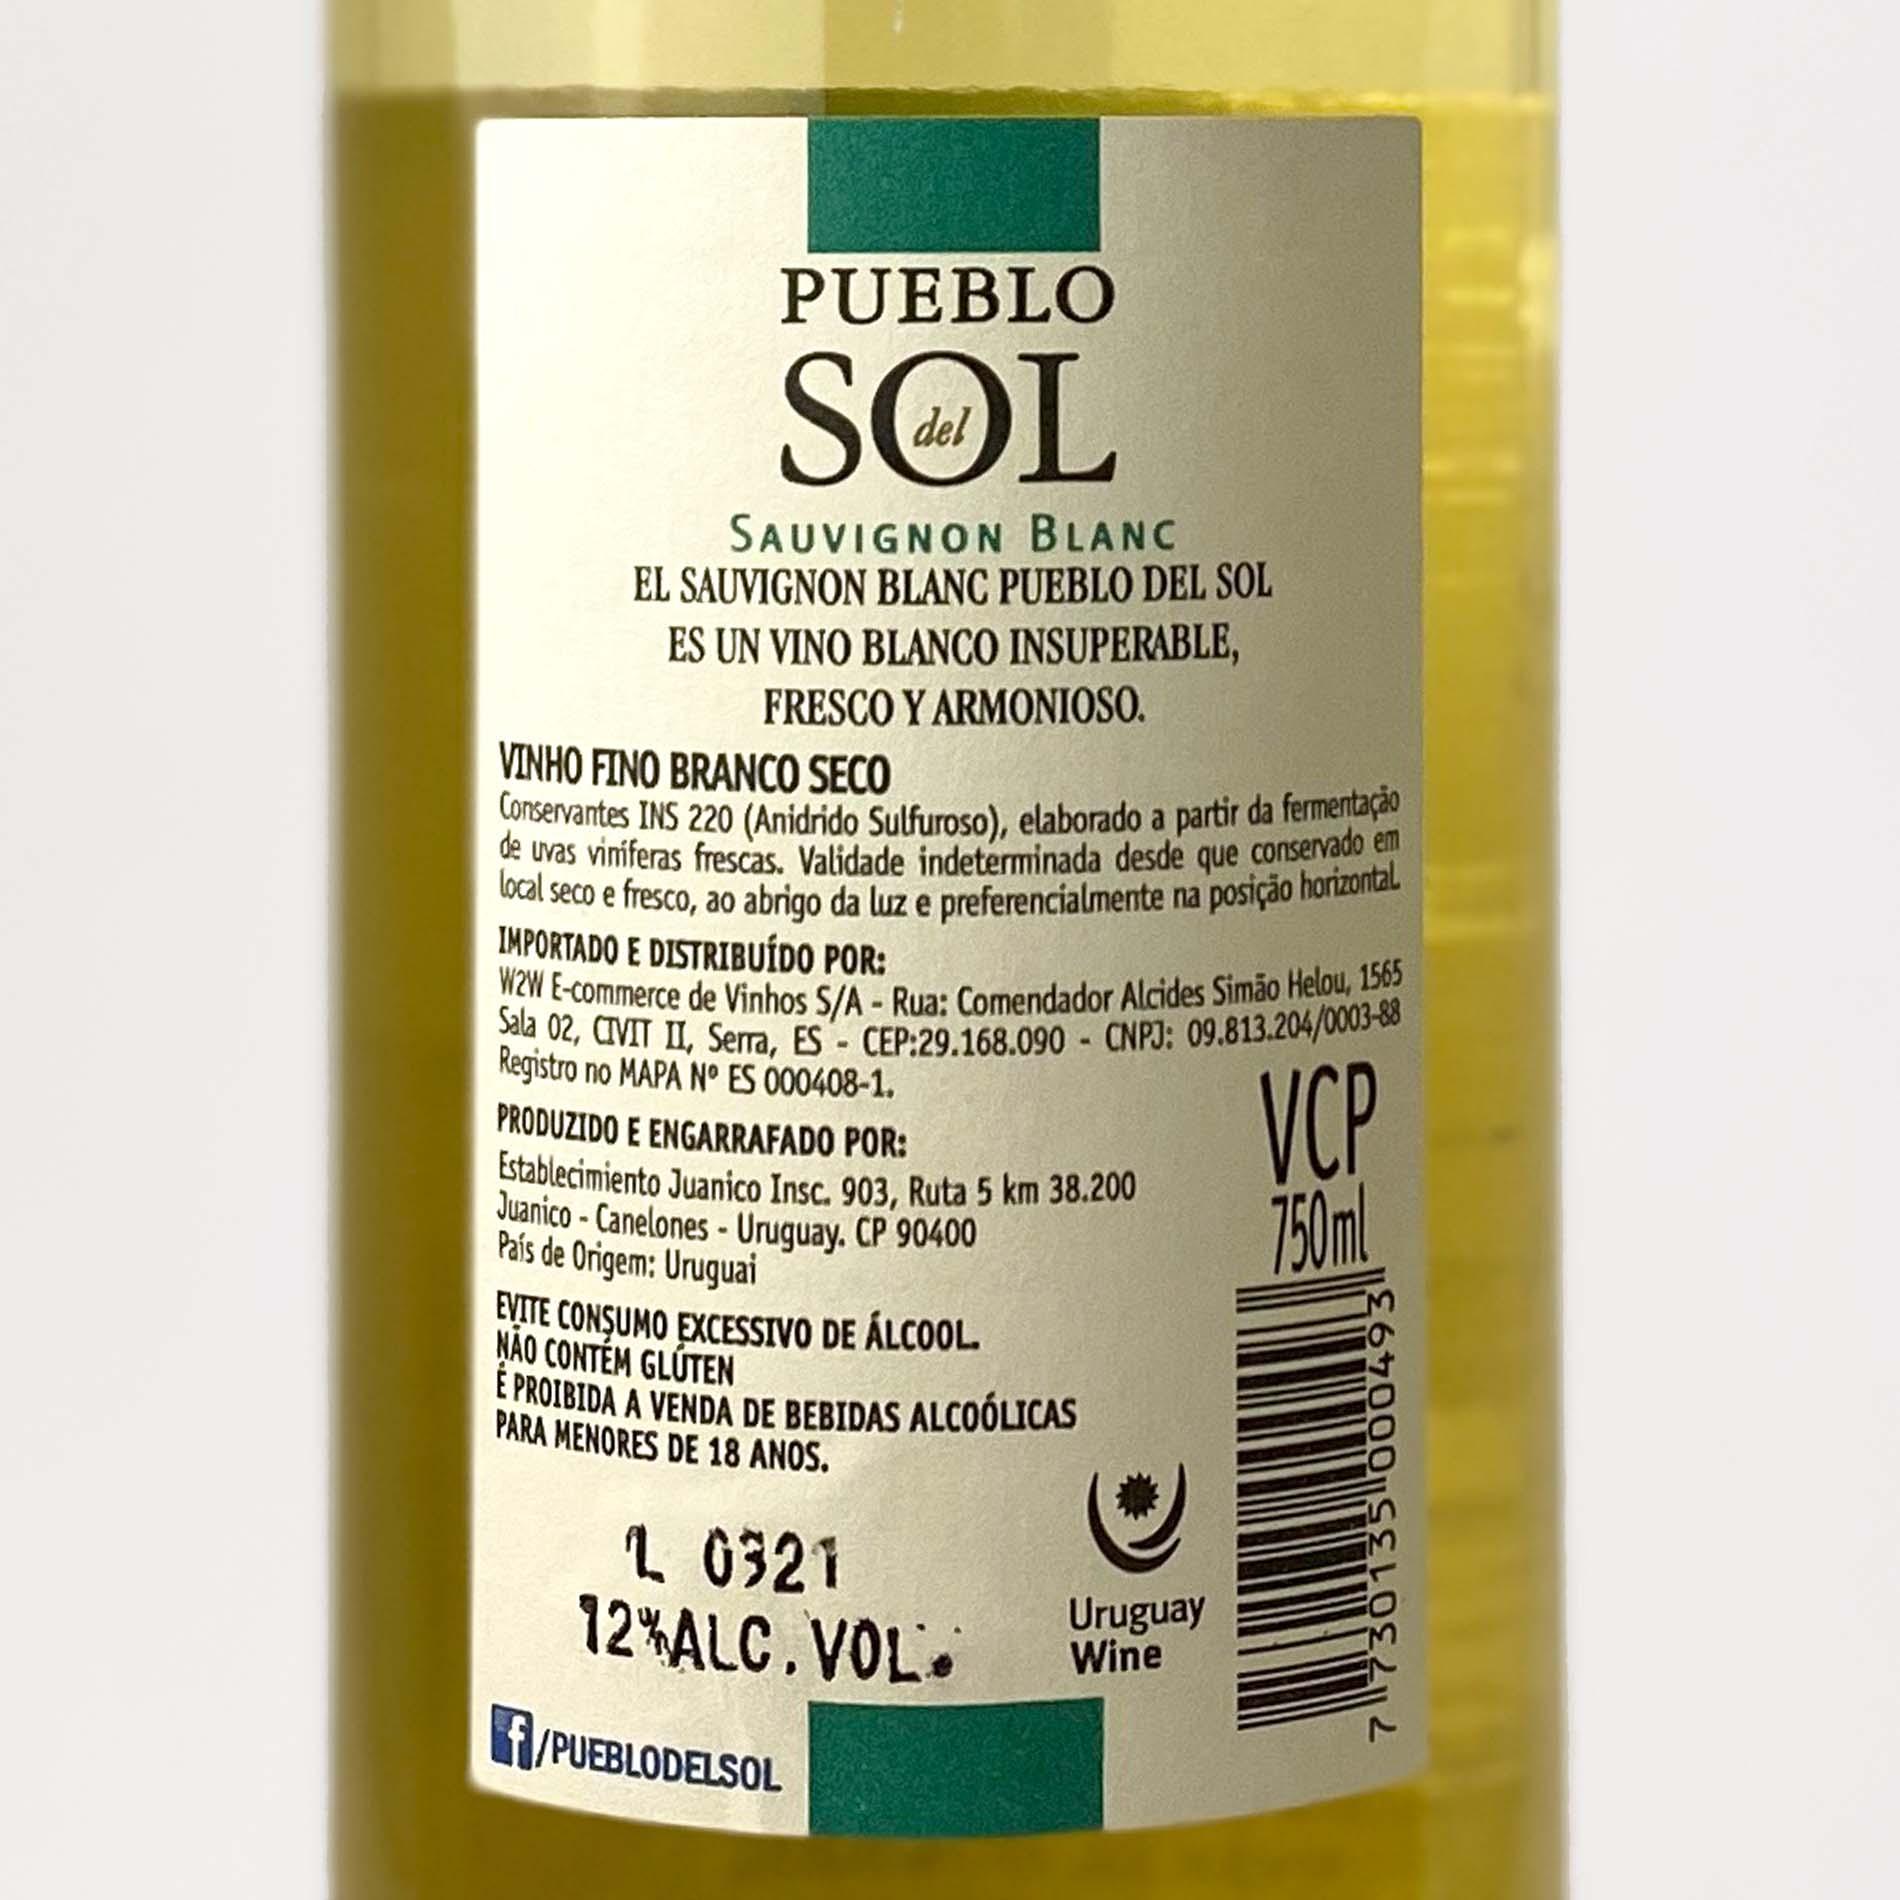 Pueblo del Sol Sauvignon Blanc 2020  - Vinerize